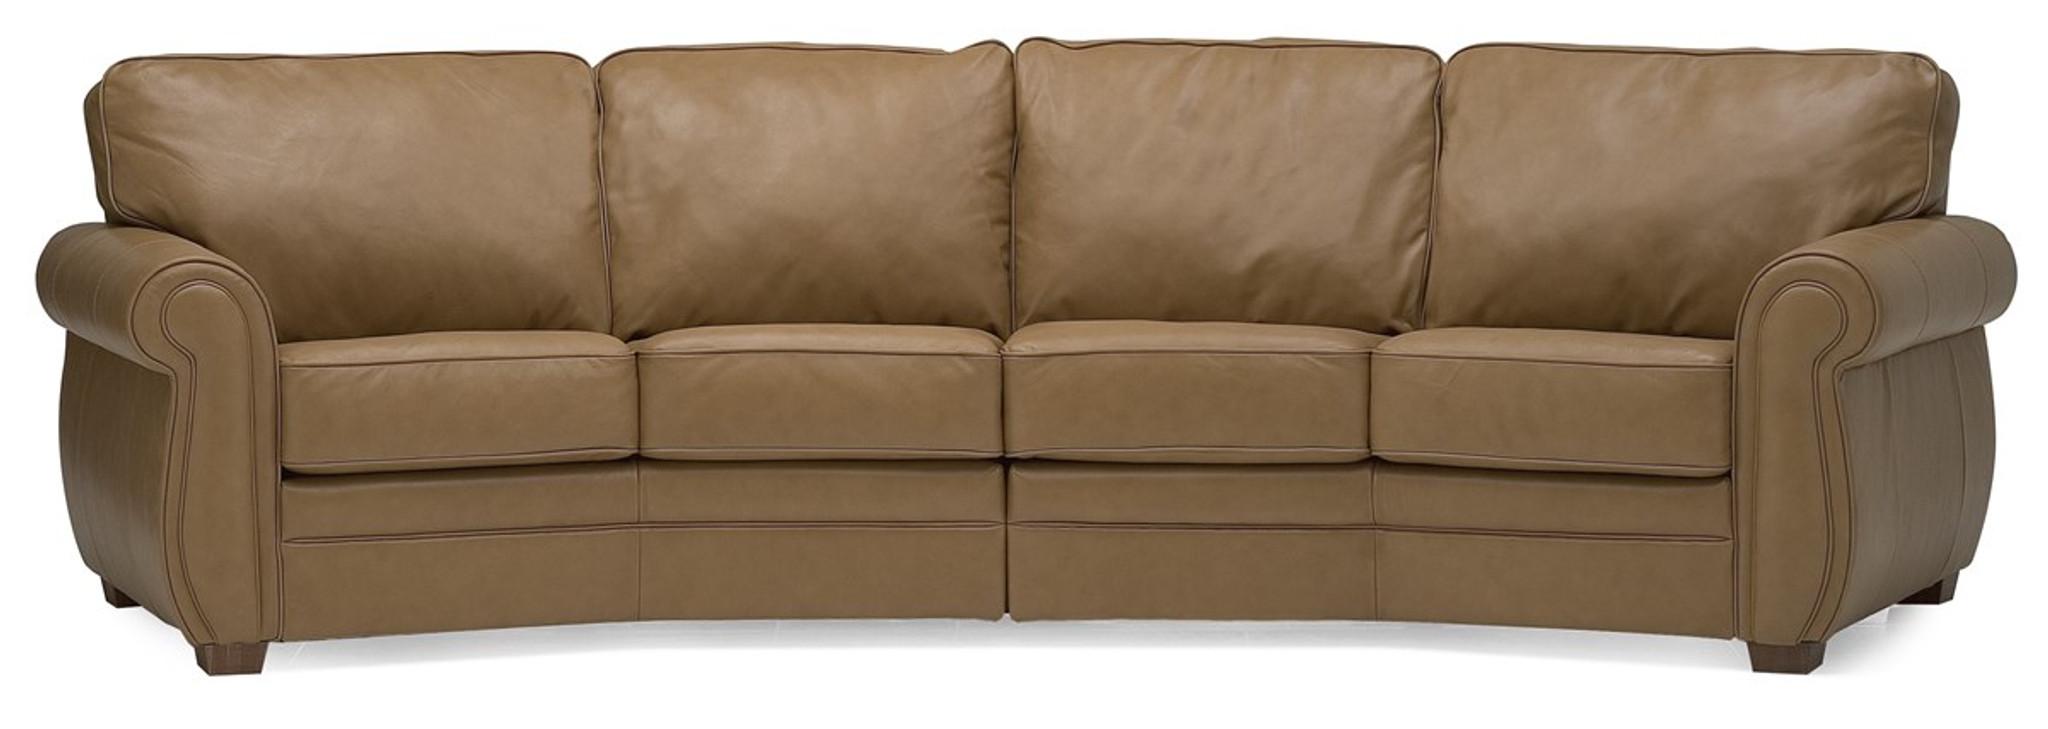 Palliser Leather Sofa Sectional Model 77492 Viceroy Elements Leather